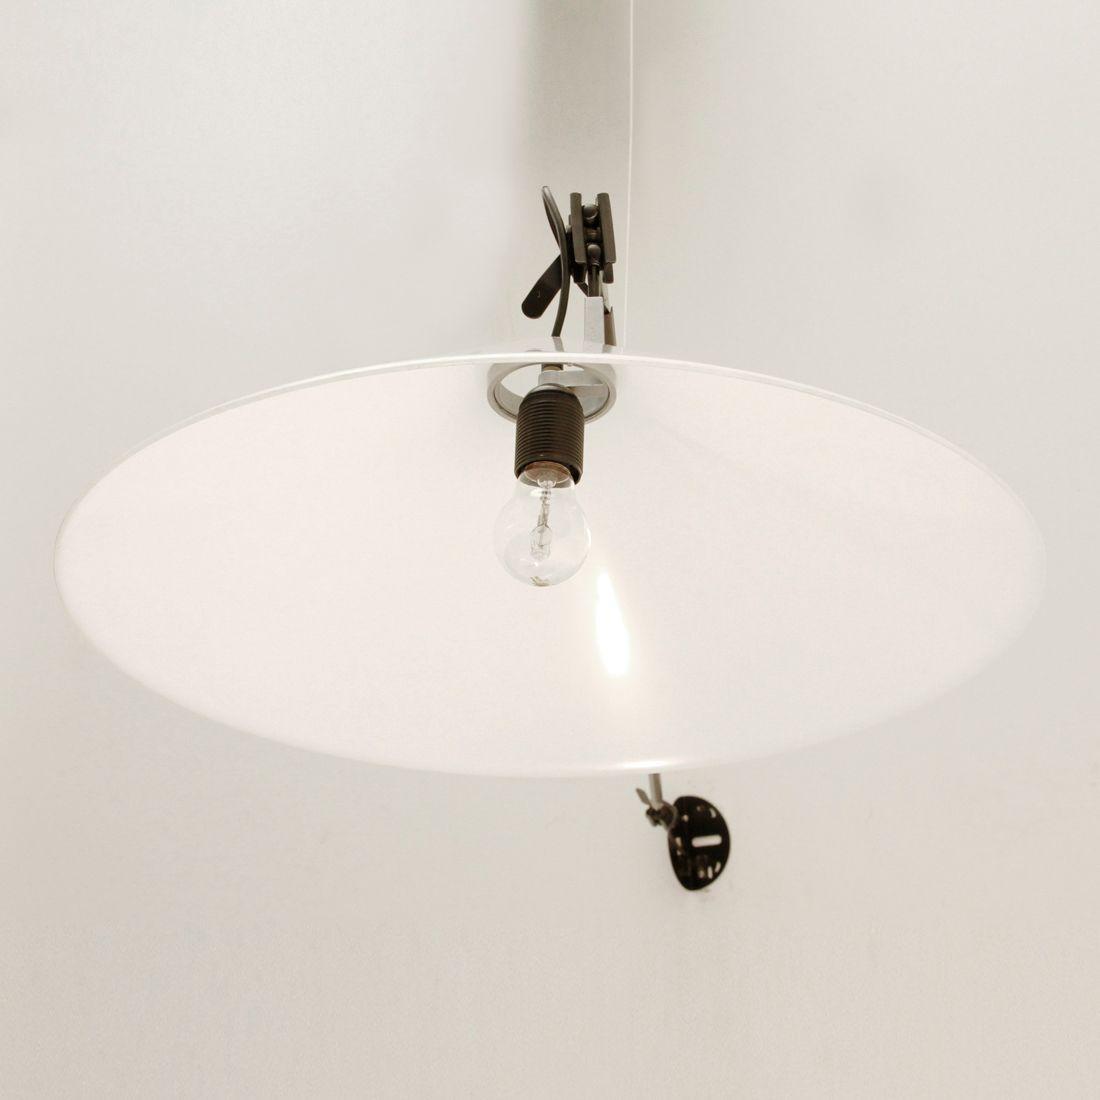 vintage aggregato wandlampe von enzo mari f r artemide bei. Black Bedroom Furniture Sets. Home Design Ideas